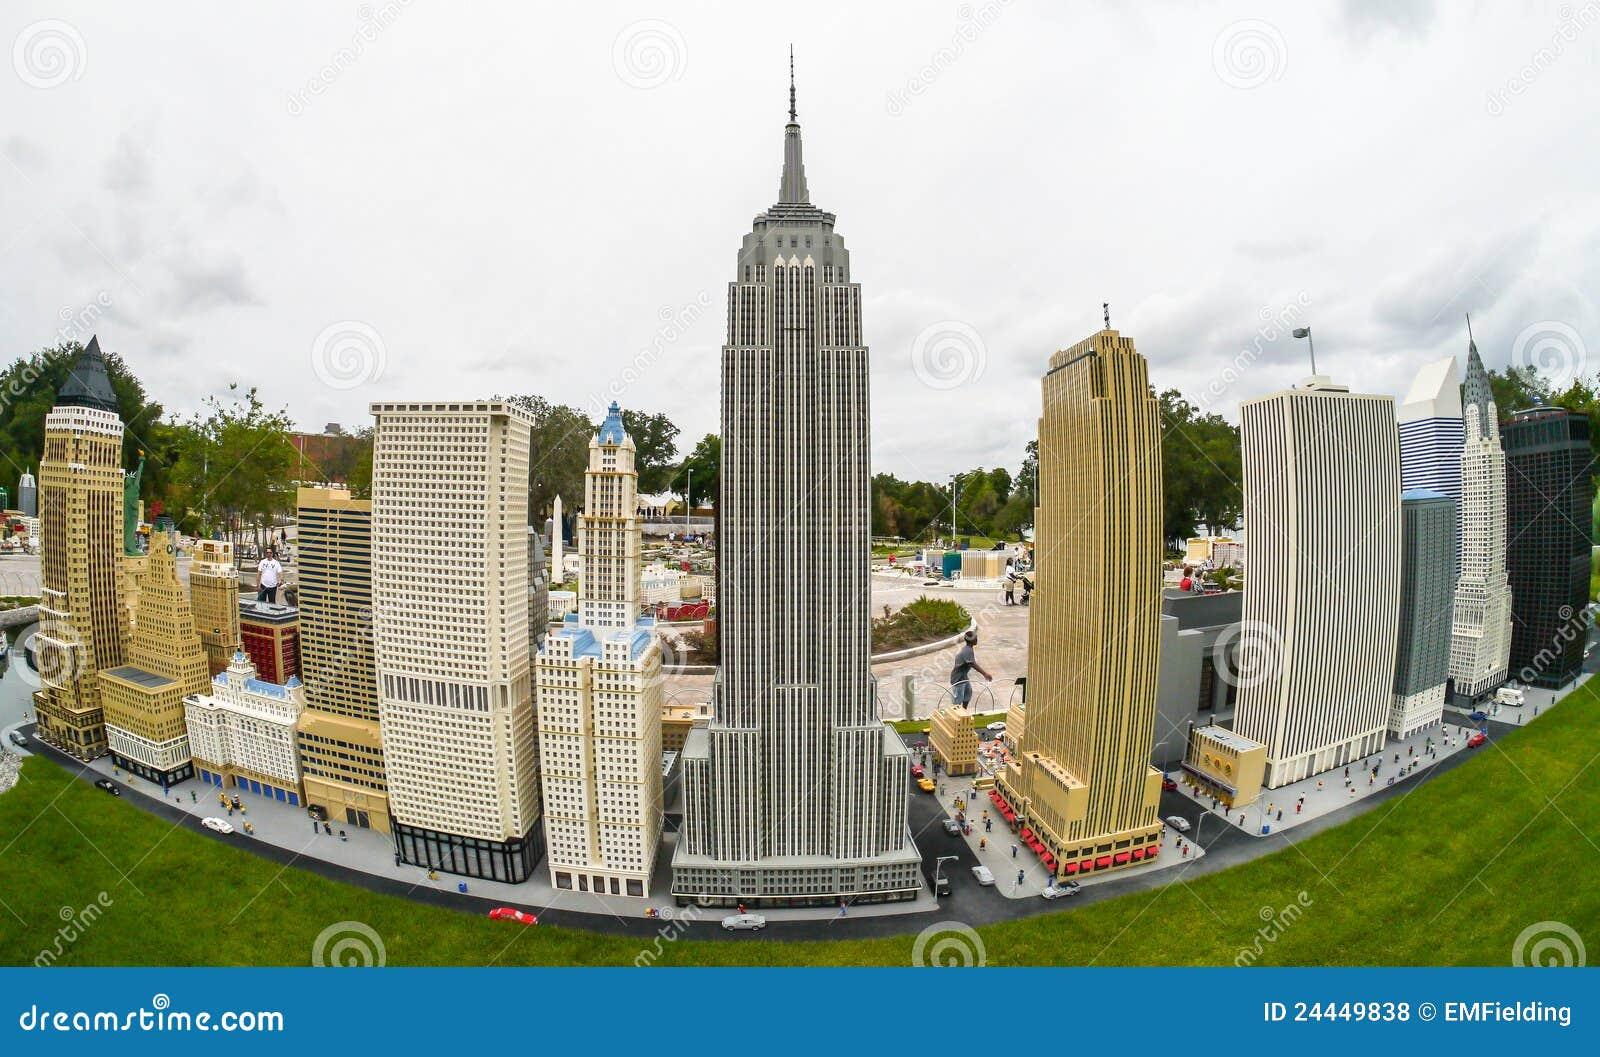 Legoland USA Floryda Miniland - Nowy Jork Linia horyzontu